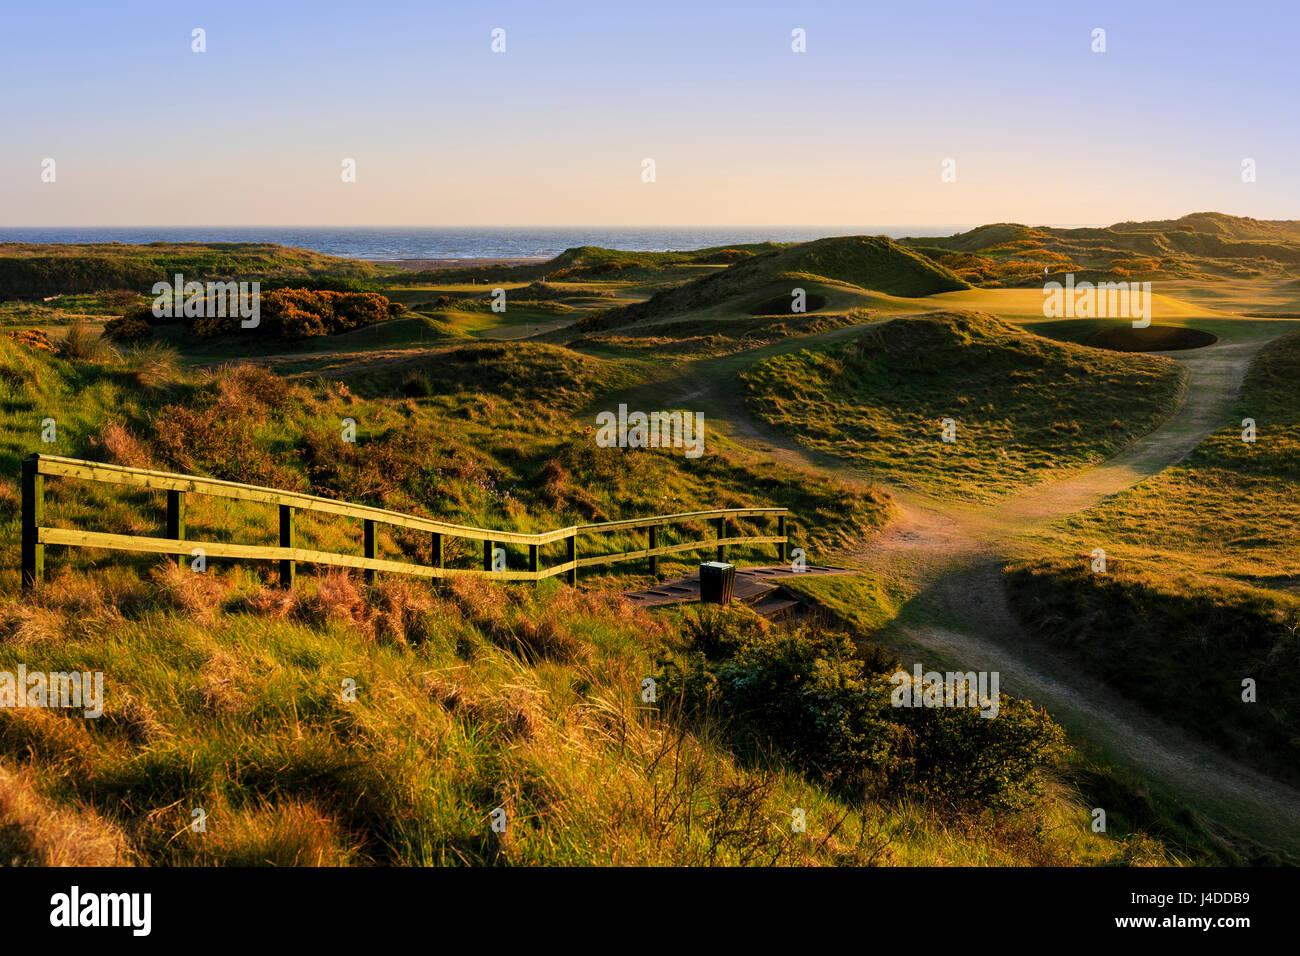 Postage Stamp Hole 8th At Royal Troon Golf Club Ayrshire Scotland UK